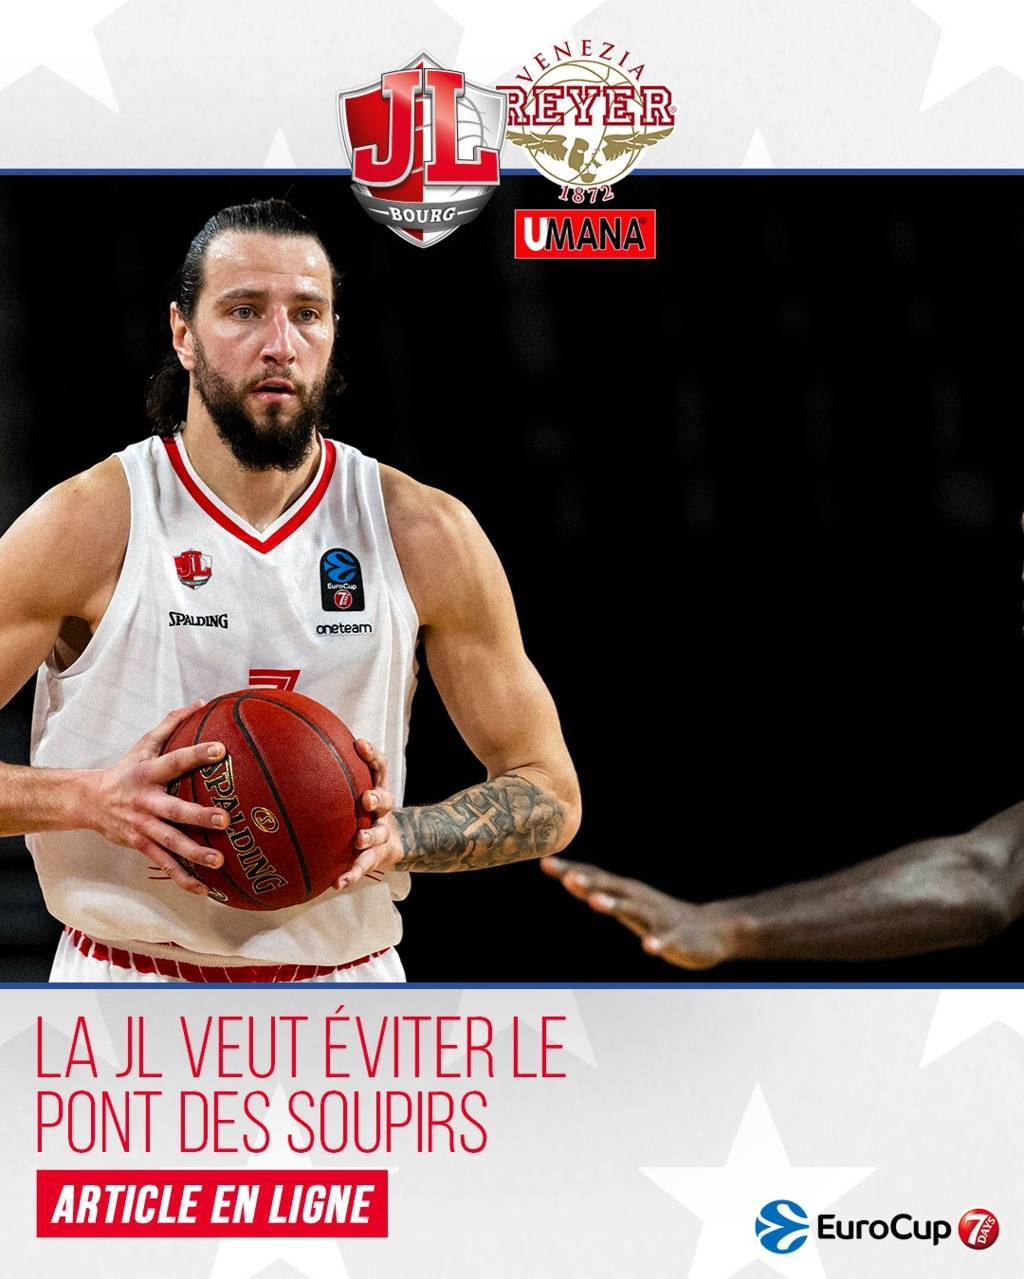 7DAYS Eurocup #Round8 2020-21: primo recupero per l'Umana Reyer Venezia al Taliercio vs i francesi del JL Bourge en Besse ma...